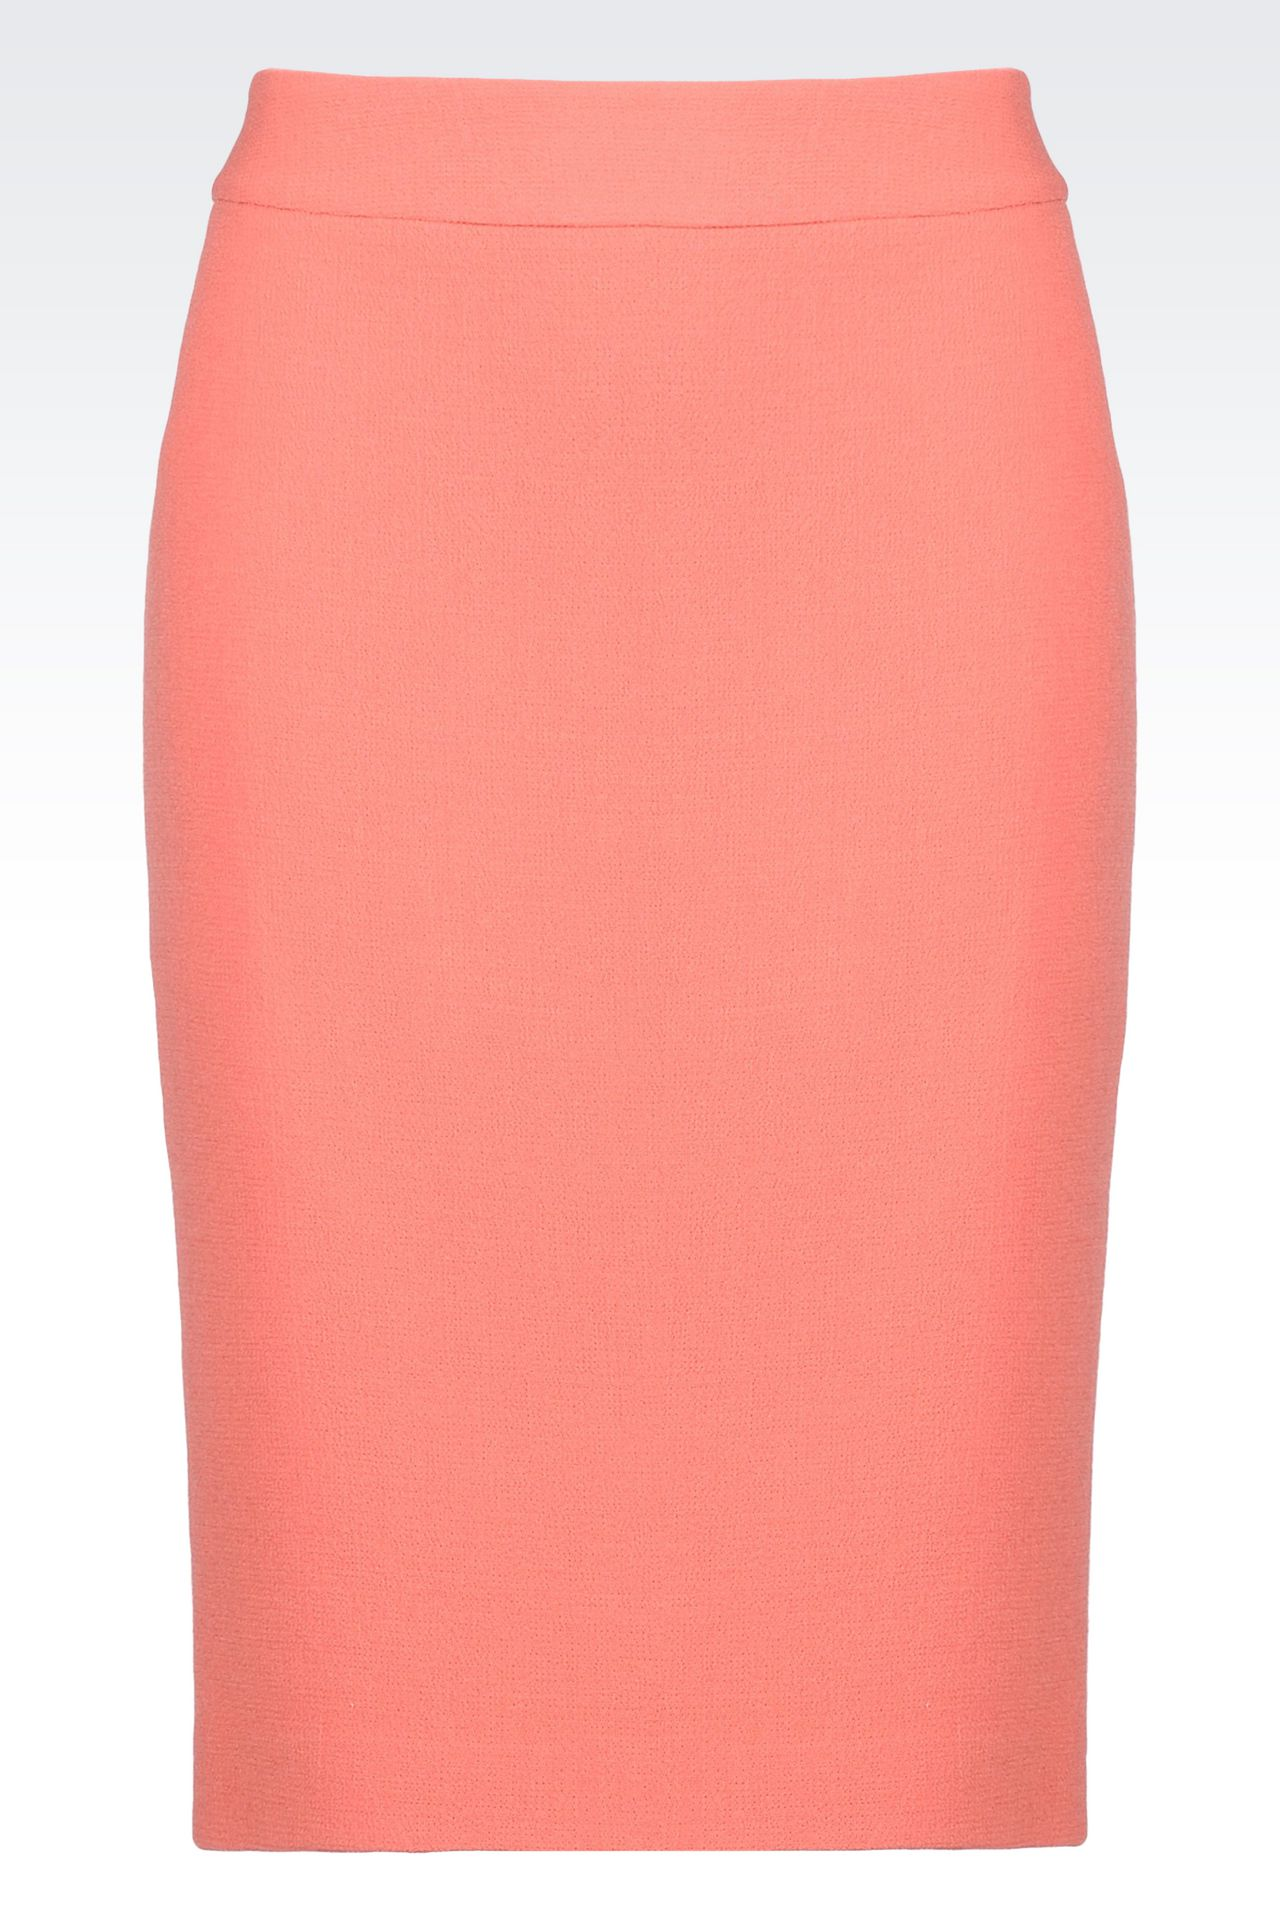 PENCIL SKIRT IN WOOL CRÊPE: Knee length skirts Women by Armani - 0